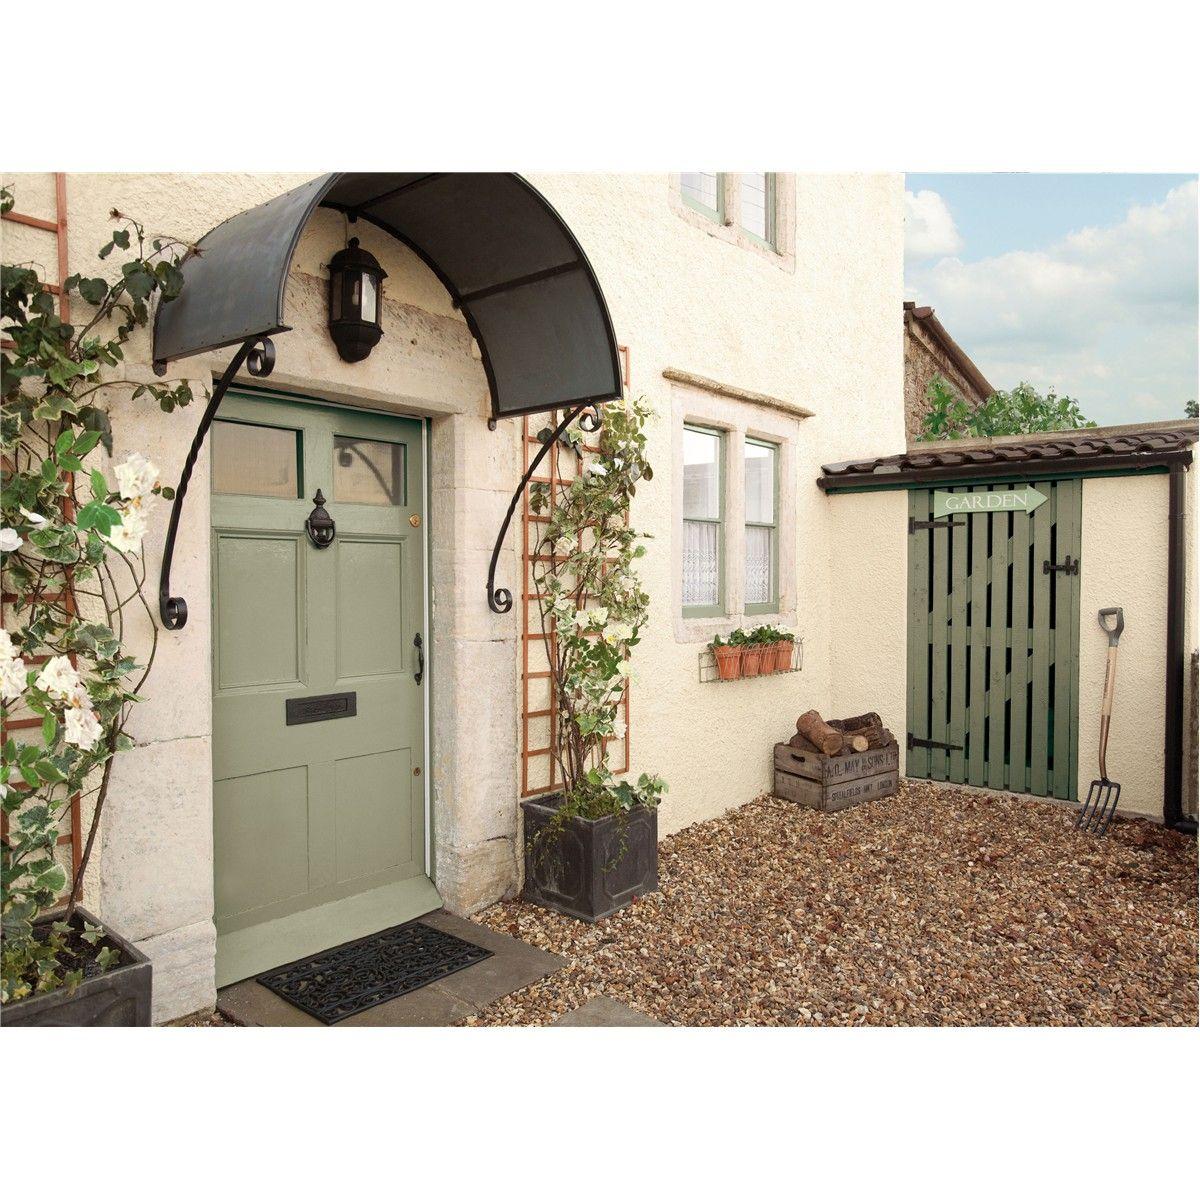 16 ideas of victorian interior design house exterior house 16 ideas of victorian interior design rubansaba